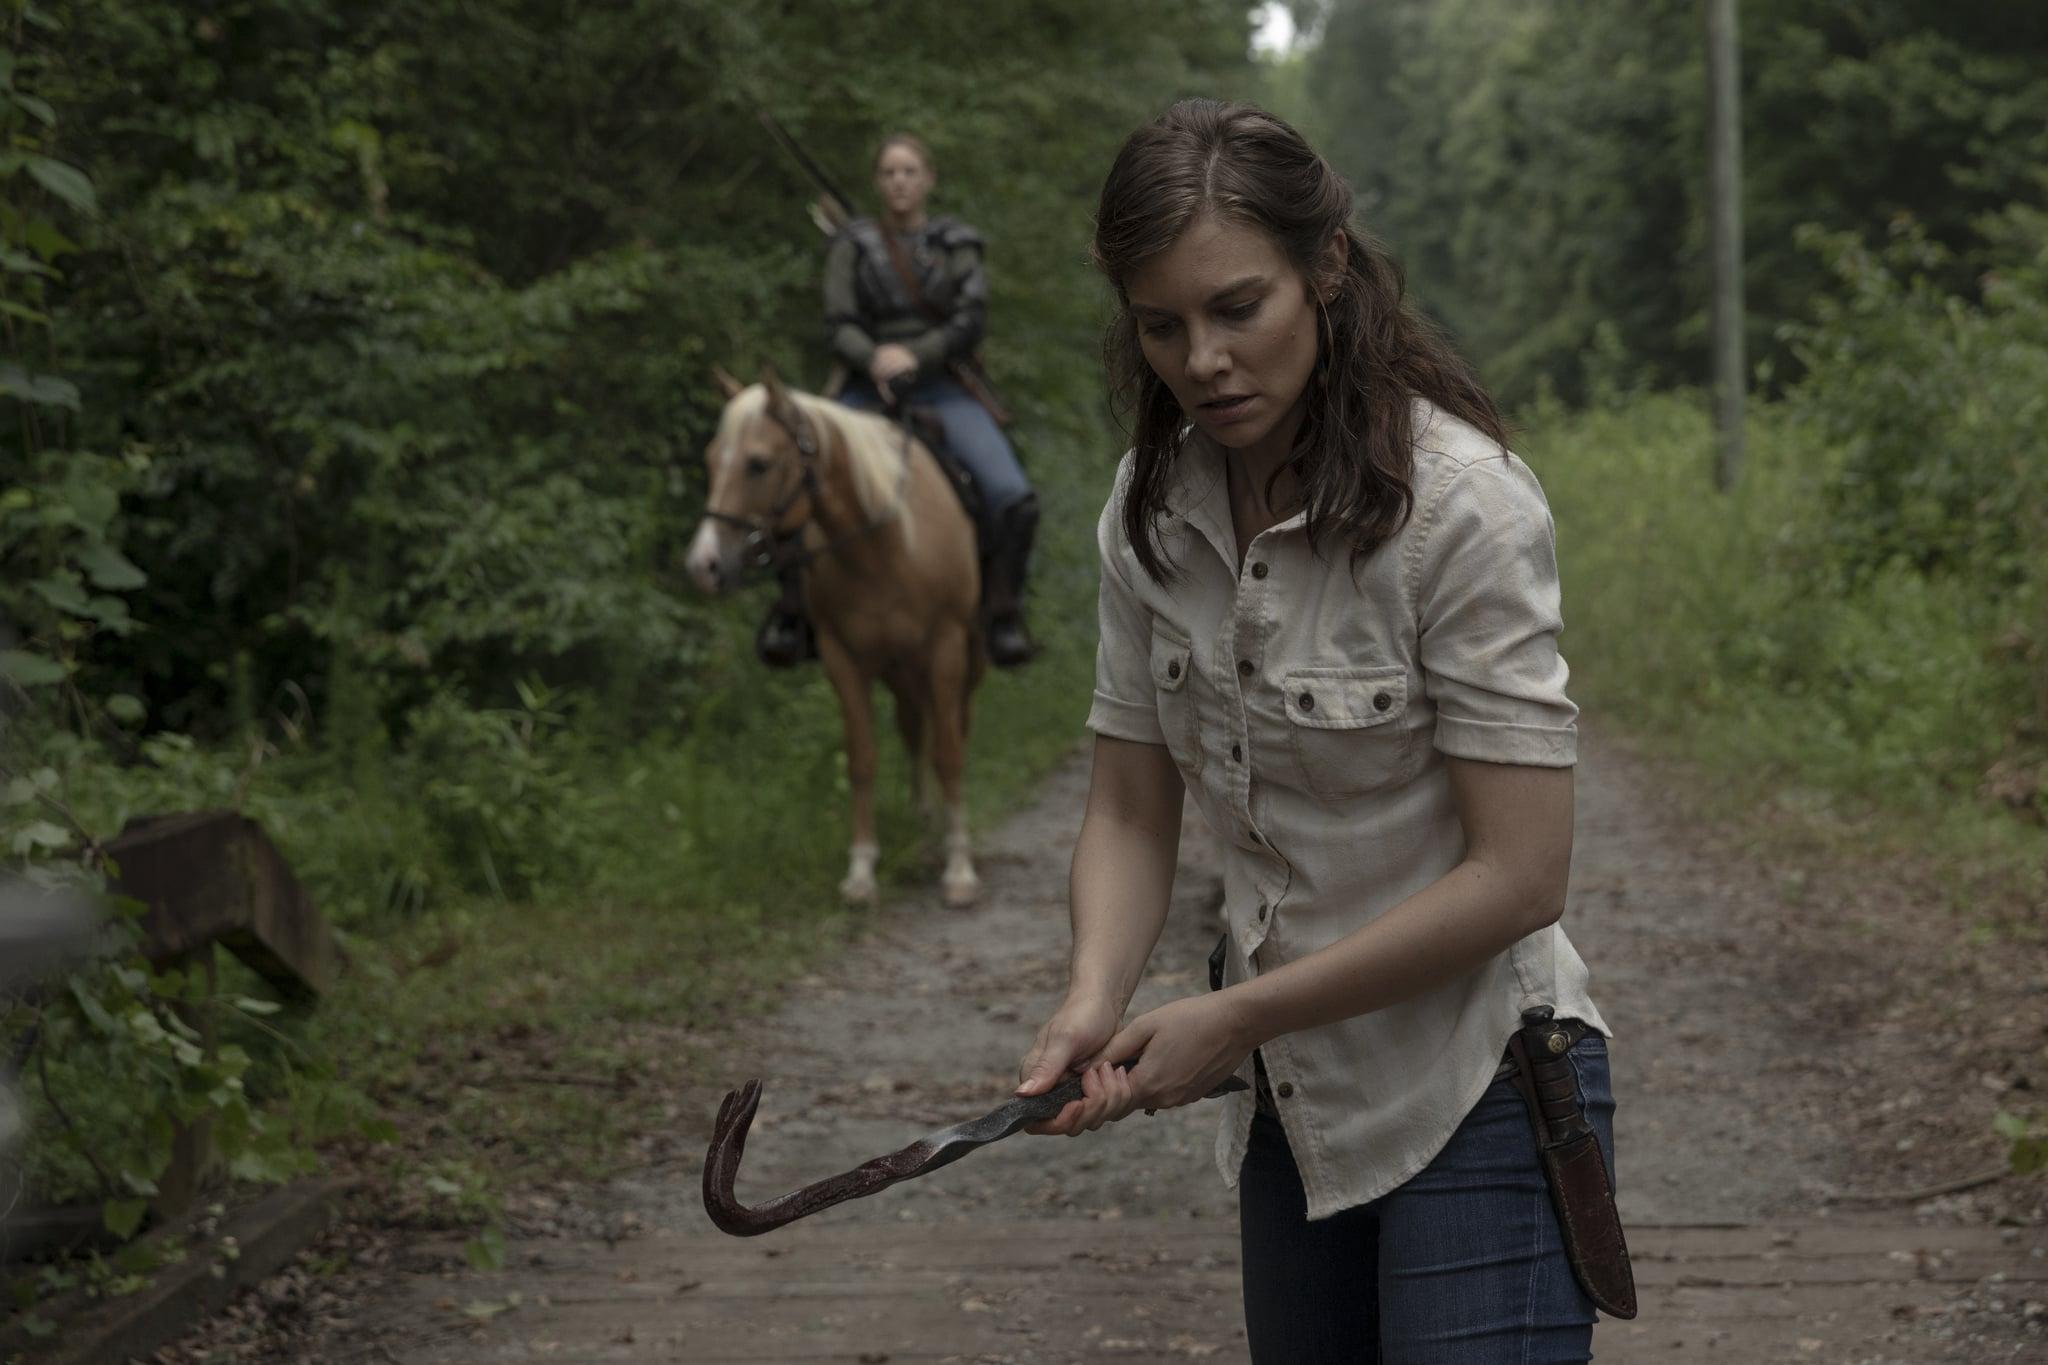 Lauren Cohan as Maggie Rhee, Kerry Cahill as Dianne - The Walking Dead _ Season 9, Episode 5 - Photo Credit: Jackson Lee Davis/AMC